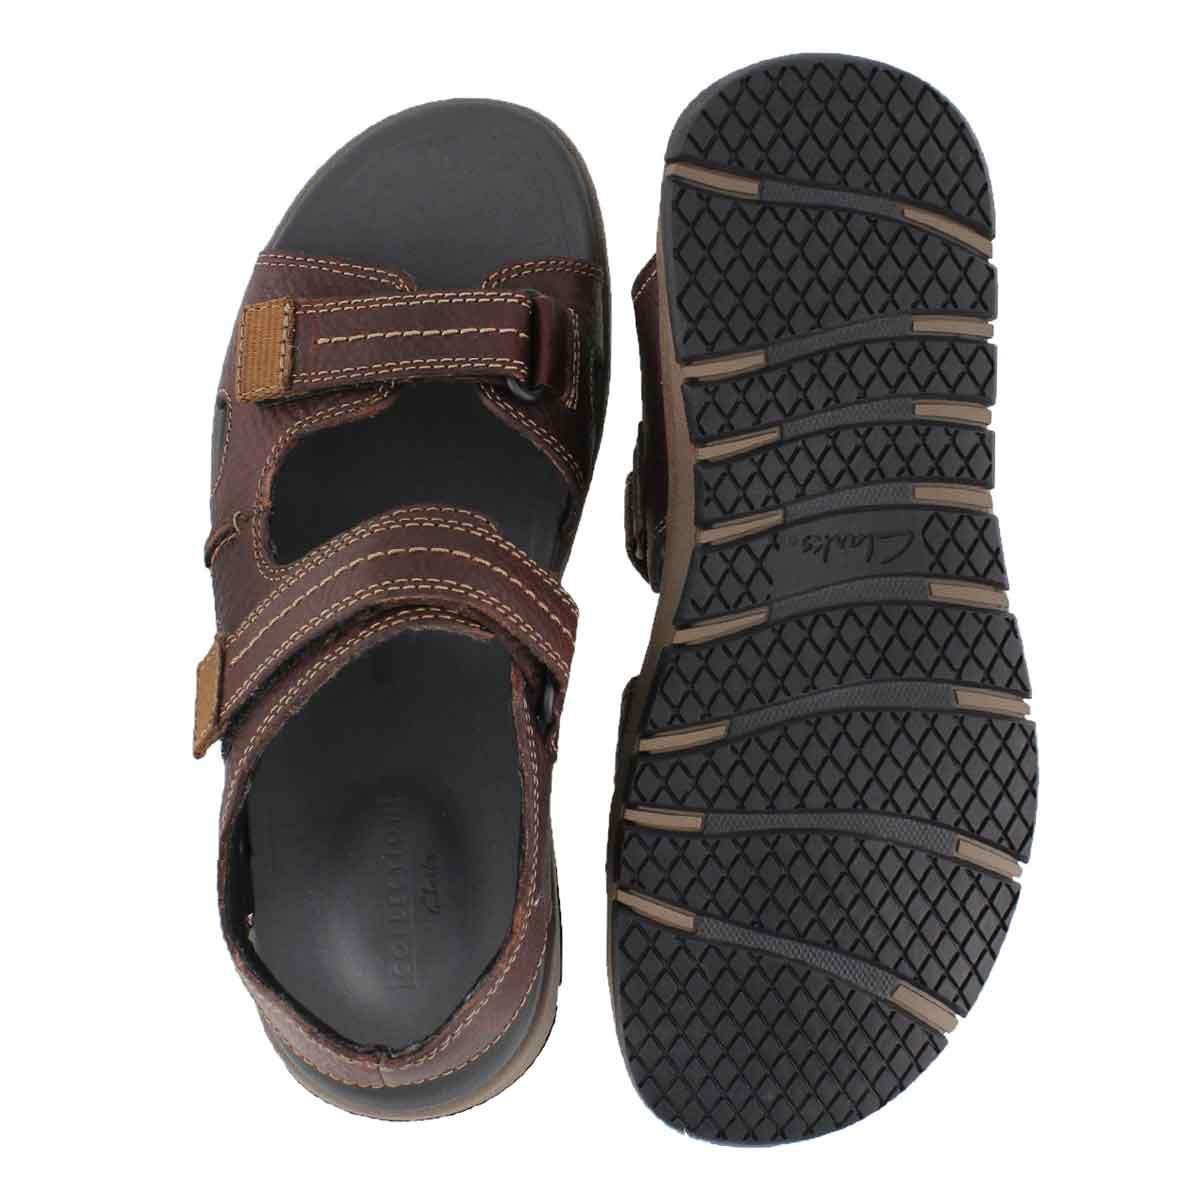 Mns Brixby Shore brit tan casual sandal